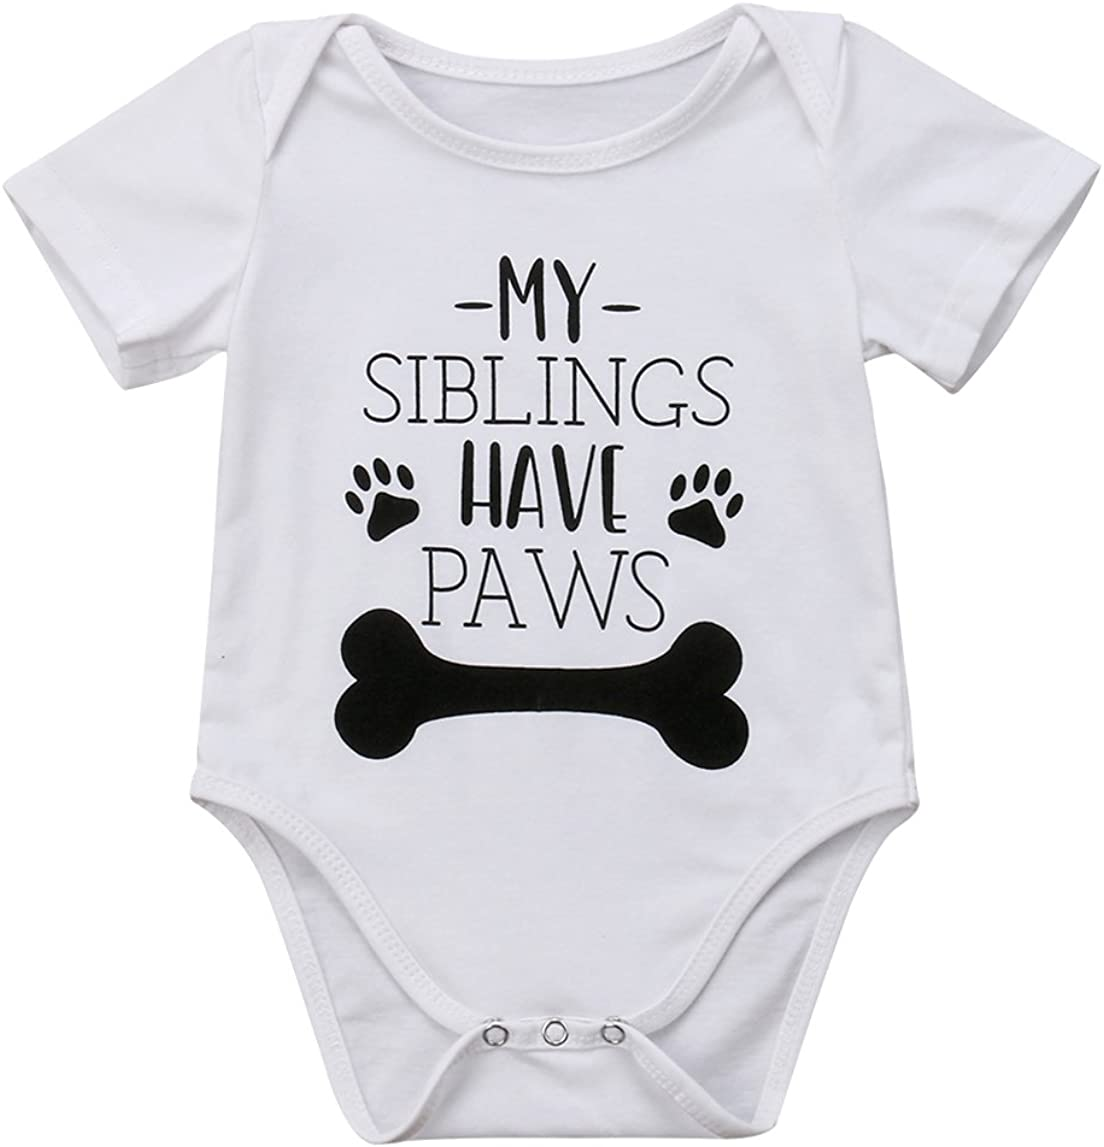 rechange Baby Boy Girl Short Louisville-Jefferson Chicago Mall County Mall Sleeve Bone Pr Cotton Letter Romper